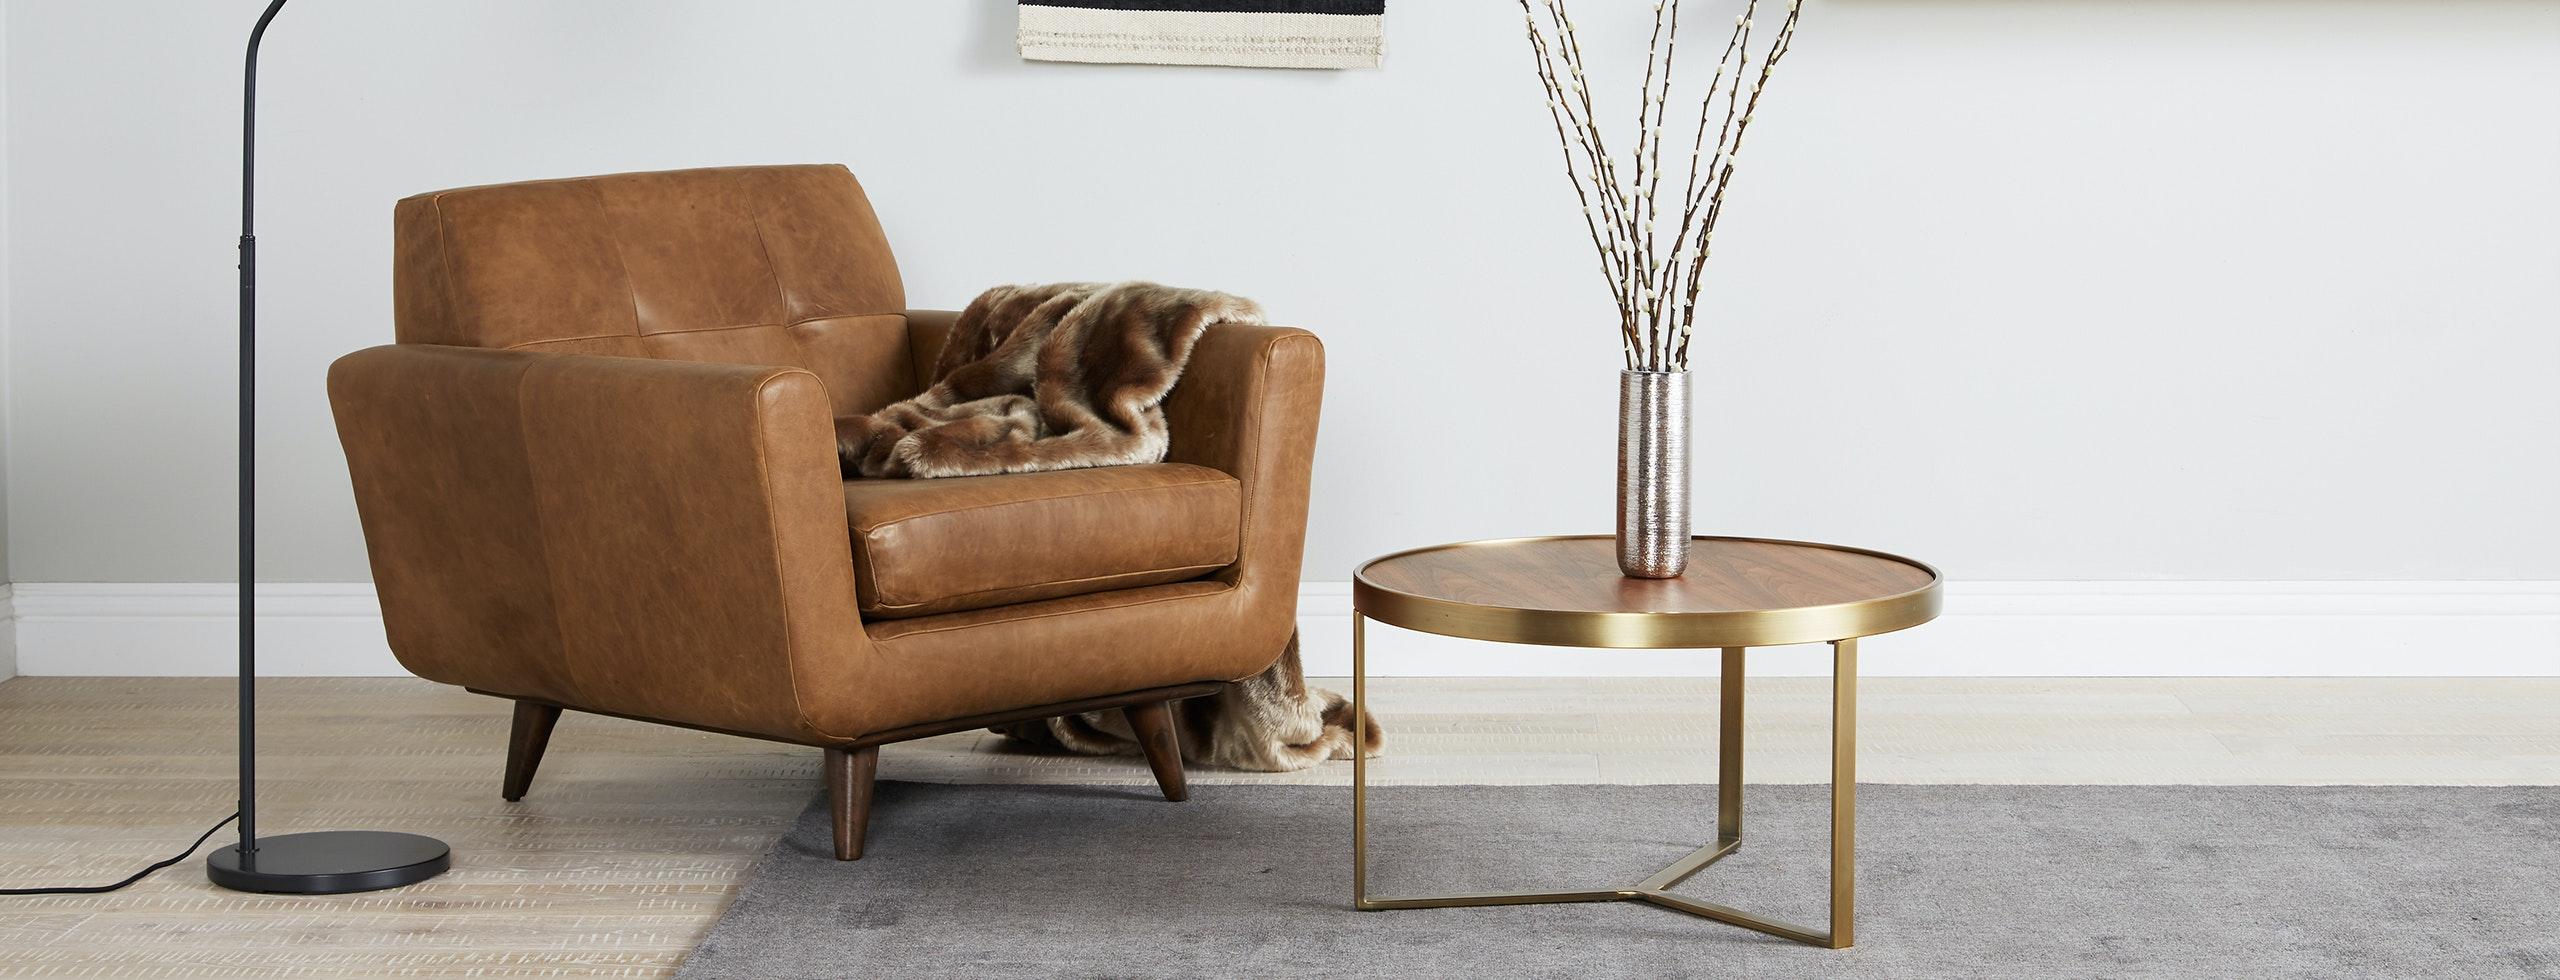 Fantastic Hughes Leather Chair Ibusinesslaw Wood Chair Design Ideas Ibusinesslaworg